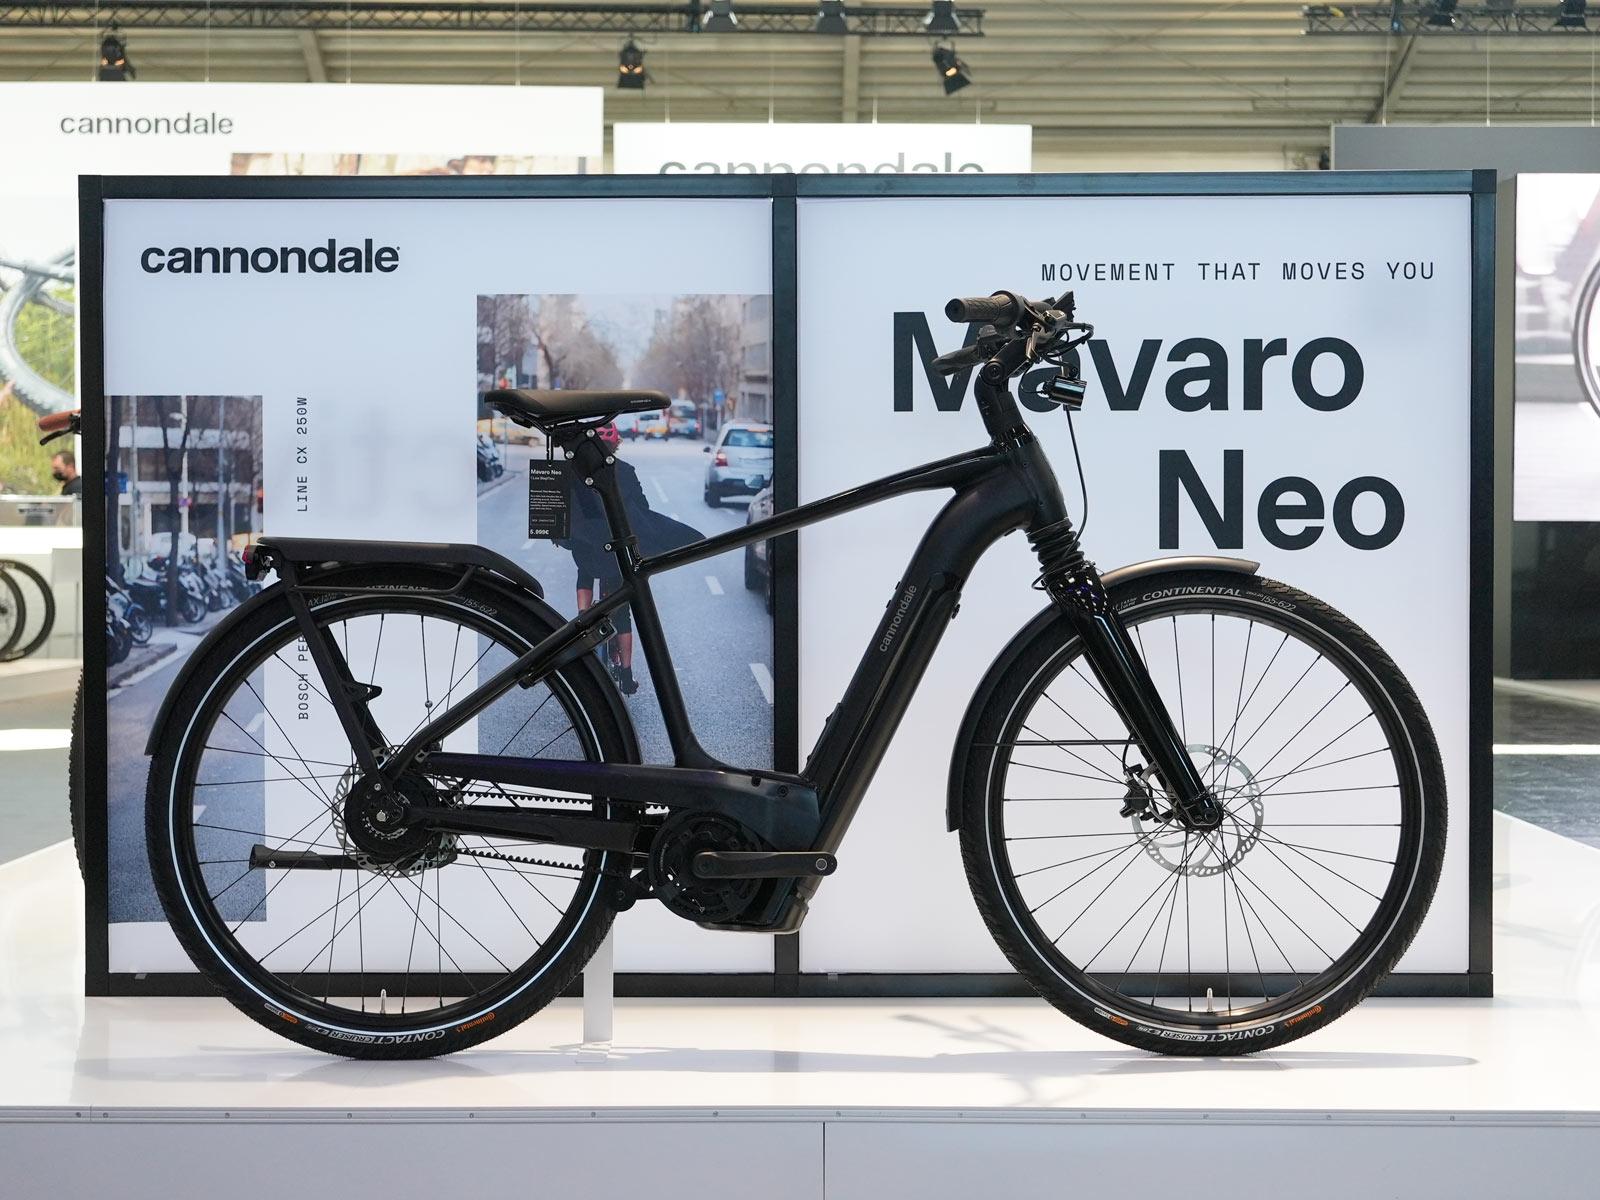 2022 Cannondale Movaro Neo standard frame